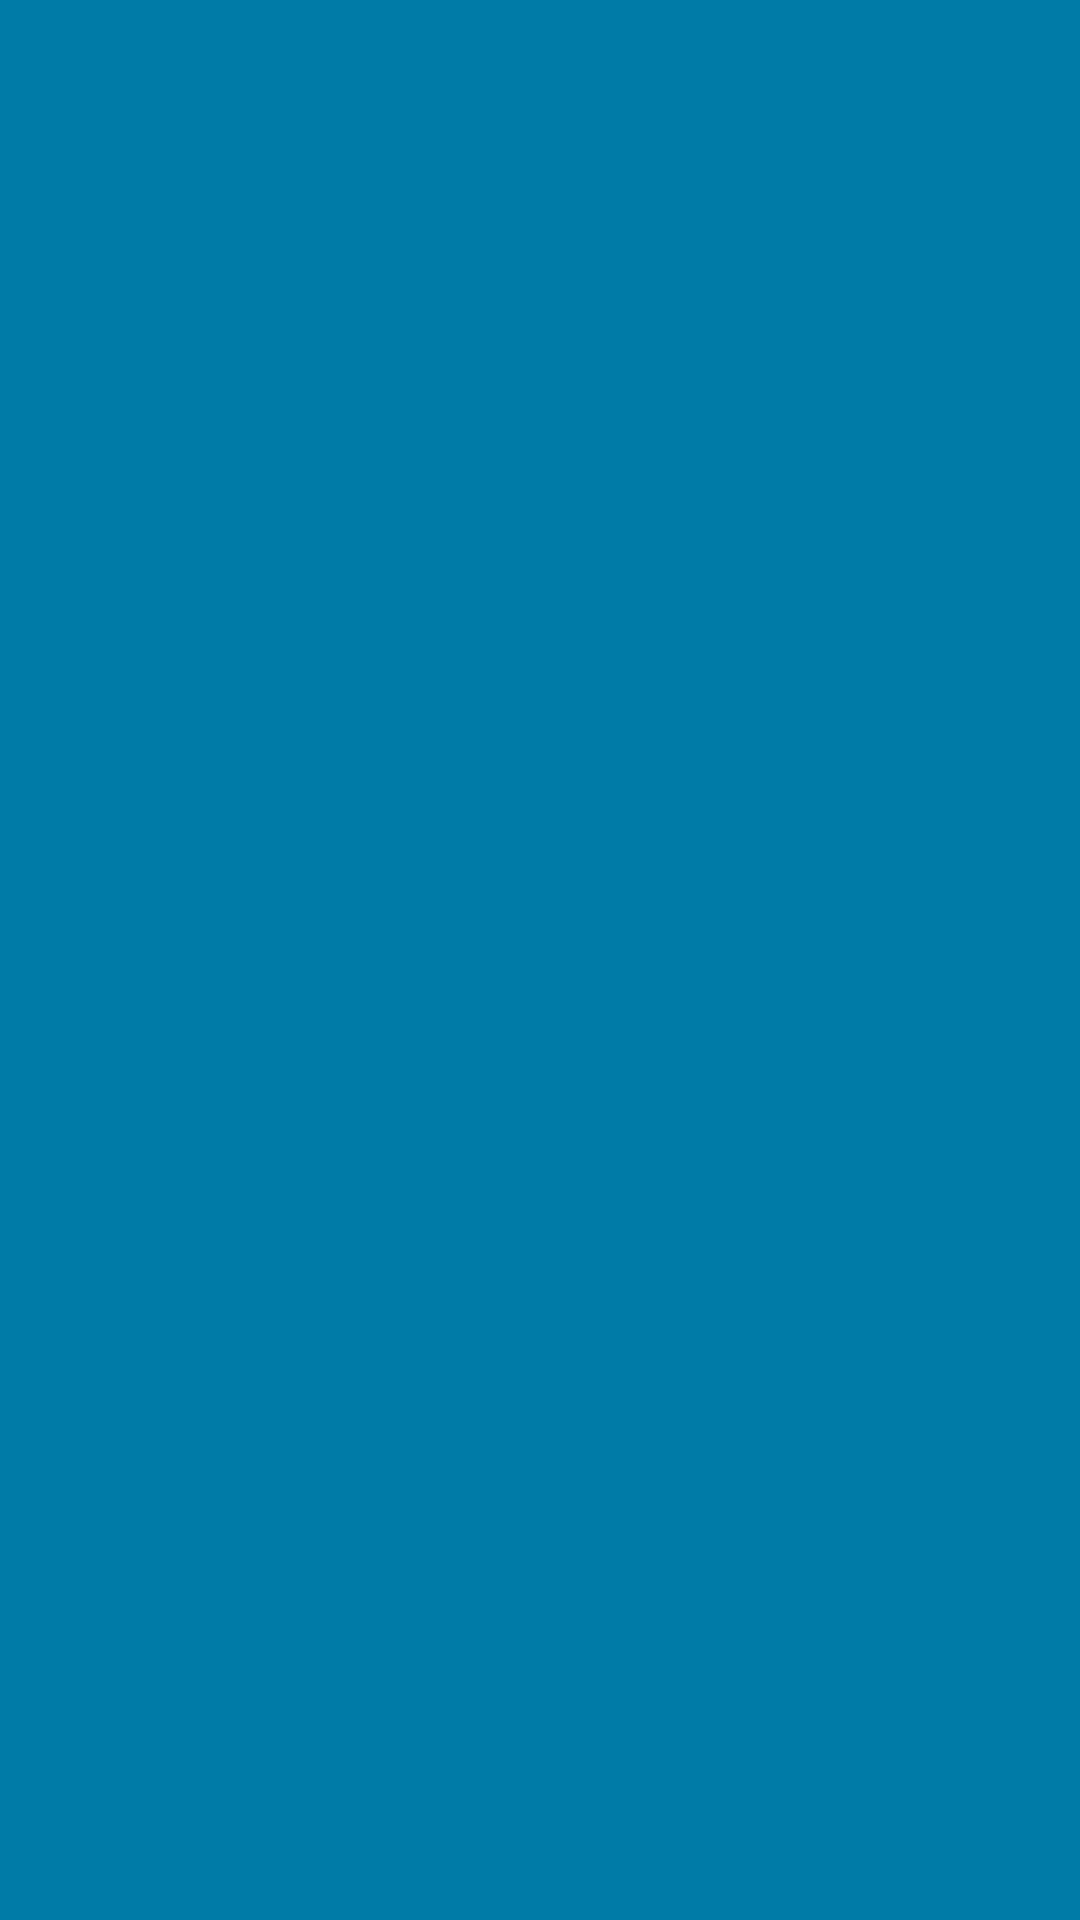 1080x1920 Celadon Blue Solid Color Background